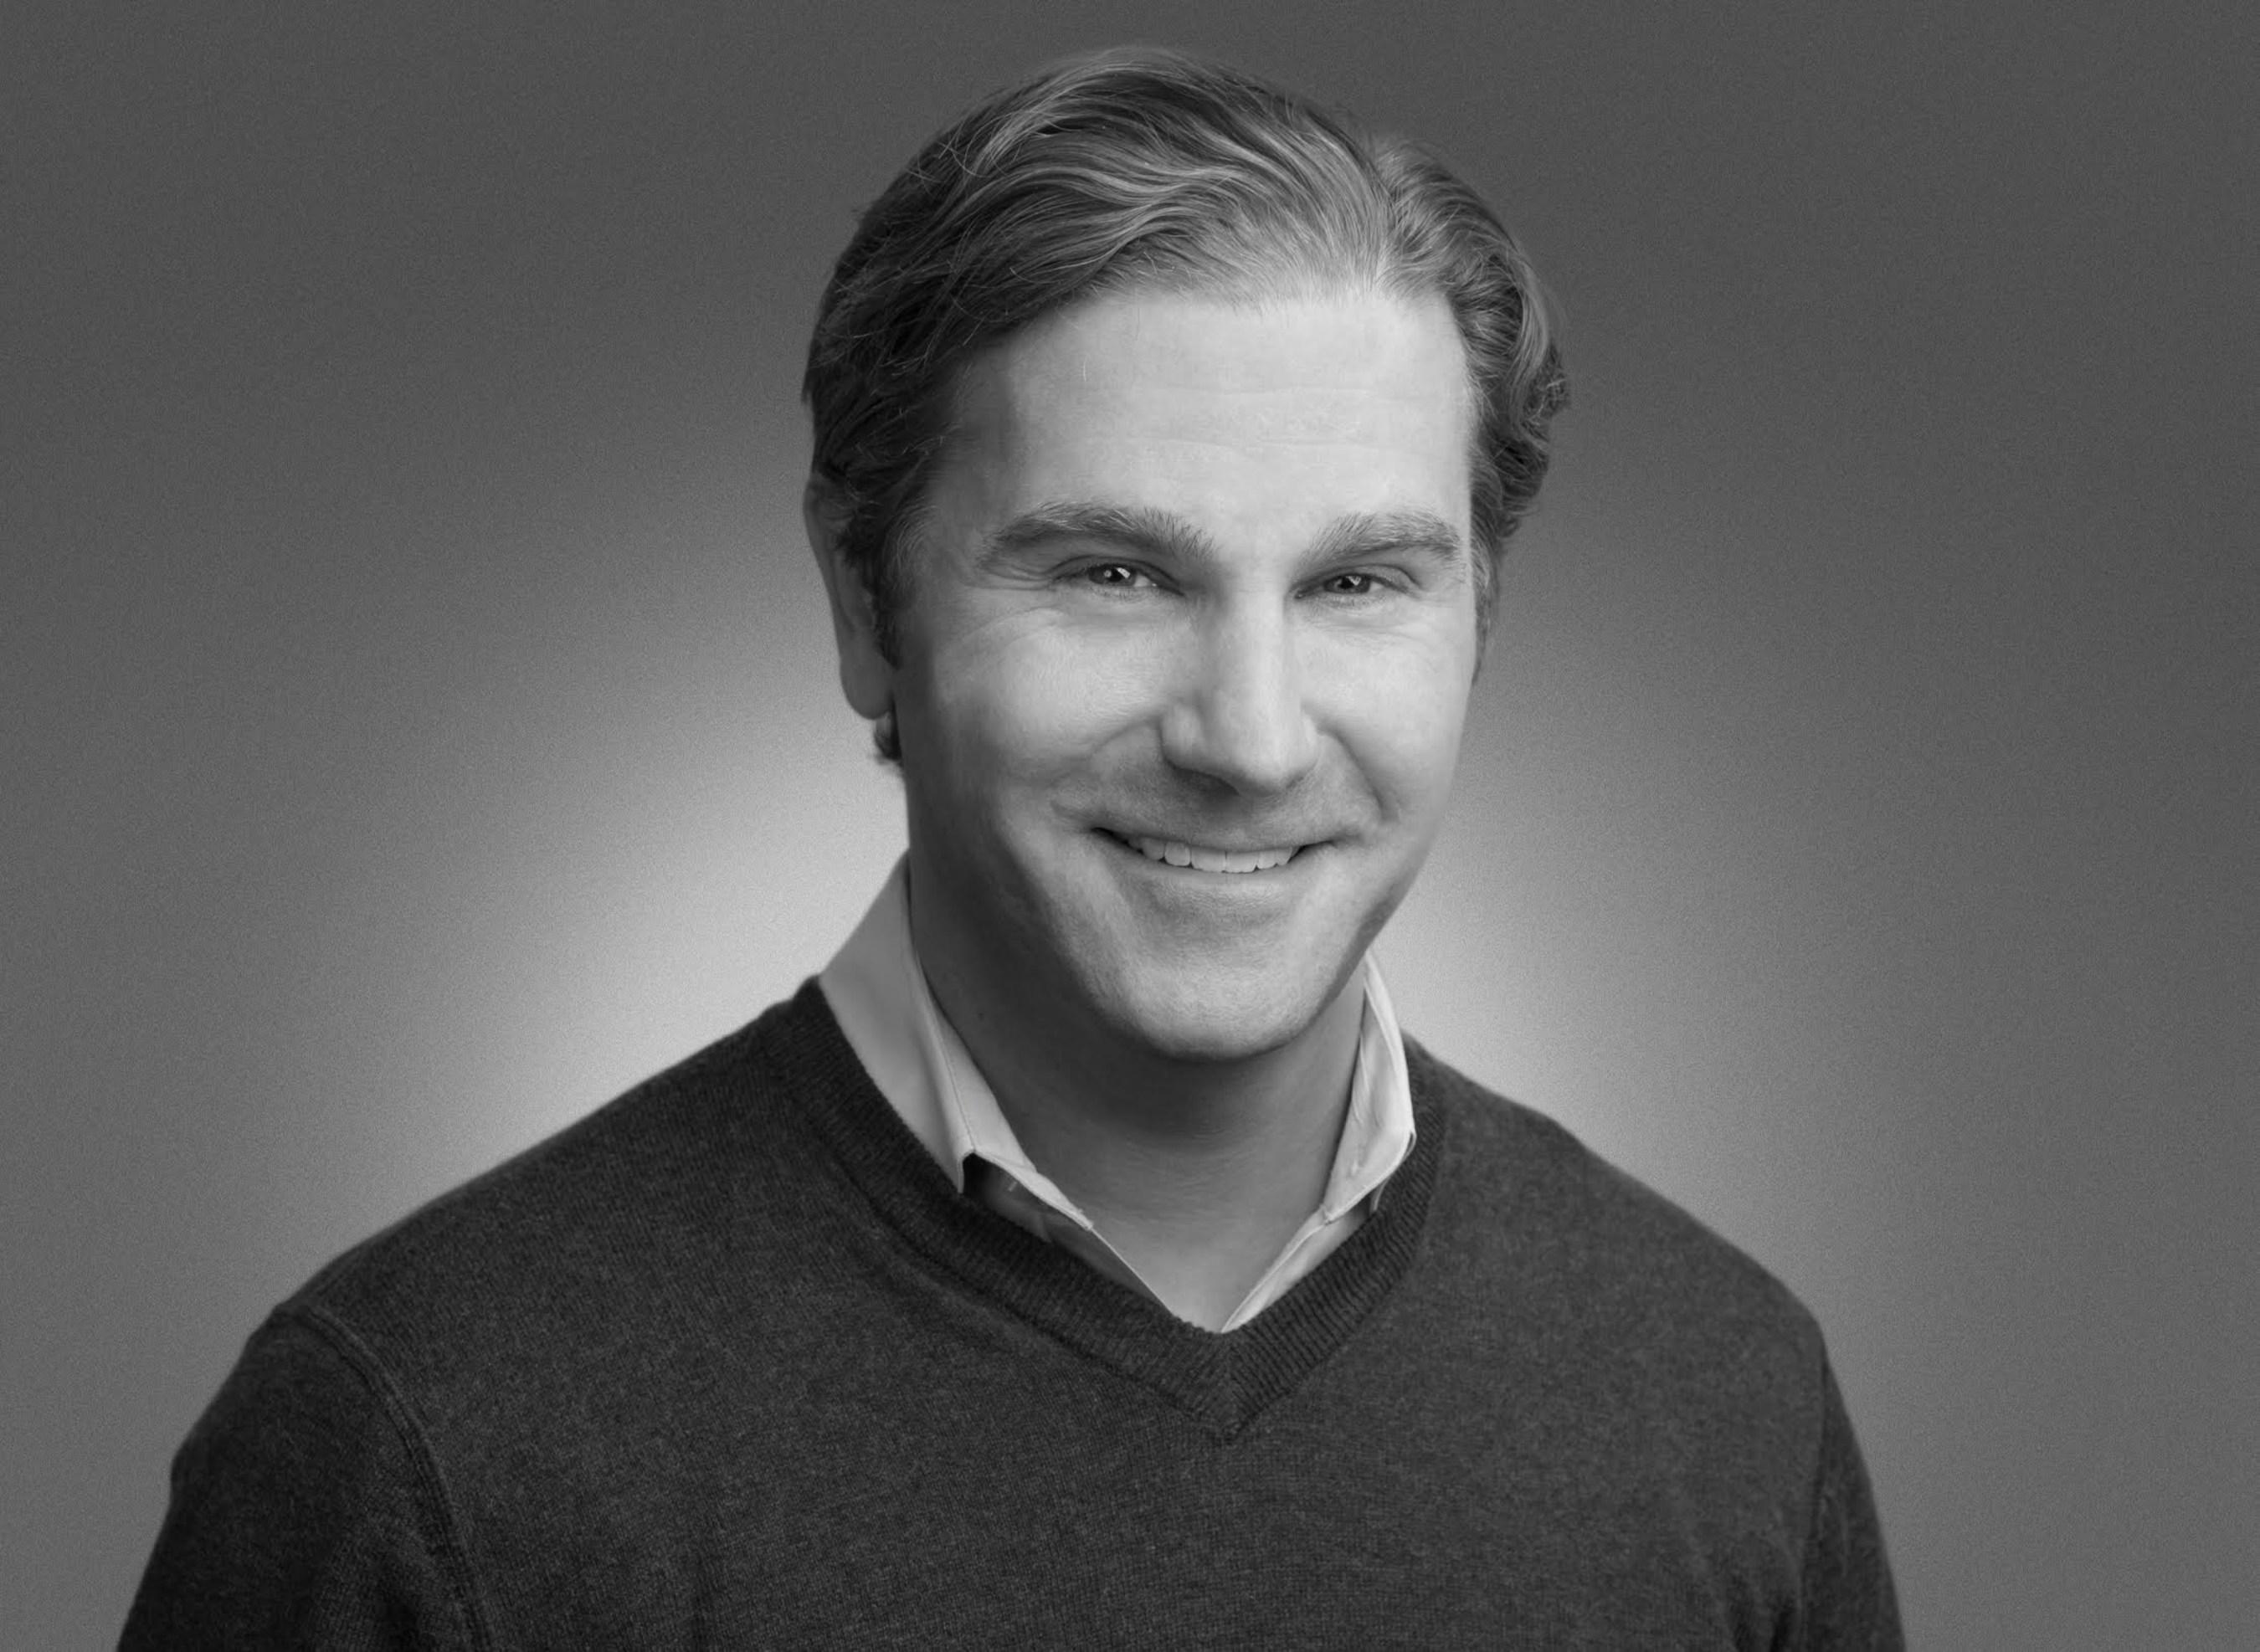 Teads Appoints Facebook Veteran Brett Wein as Head of Strategic Accounts in the U.S.